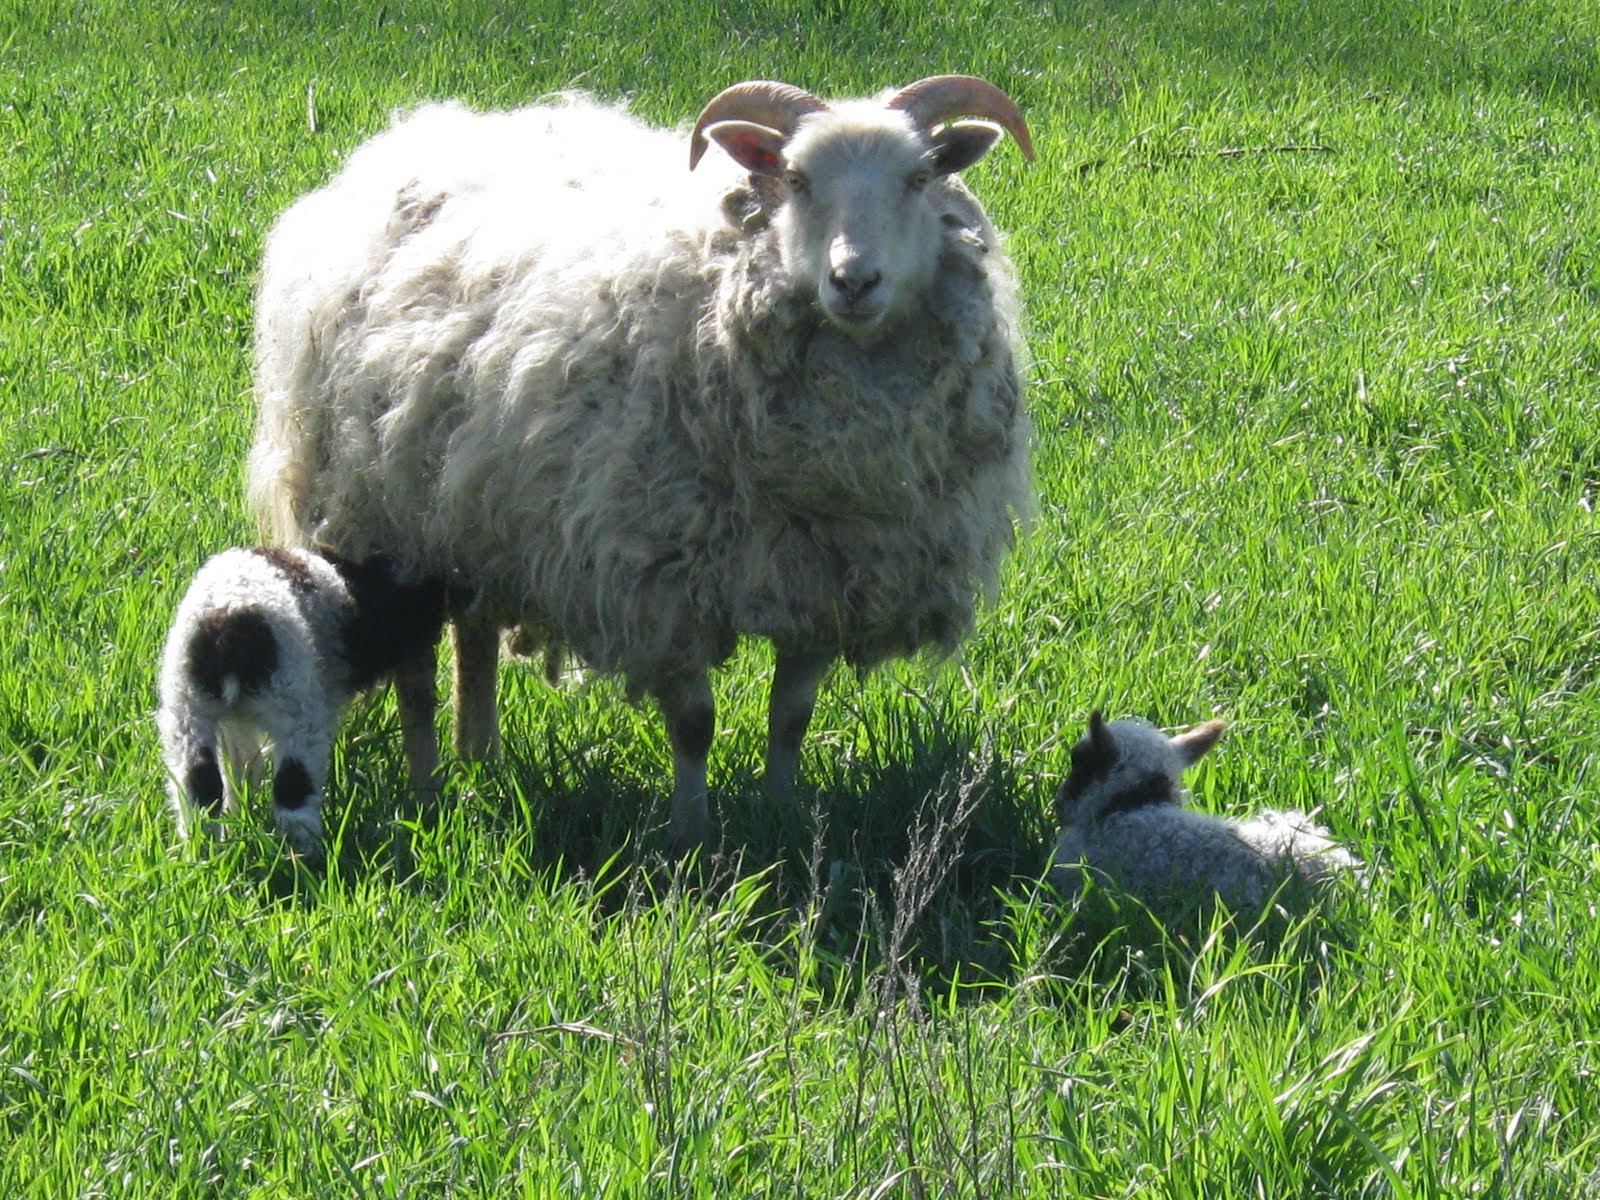 Grassstain Farm Icelandic Sheep